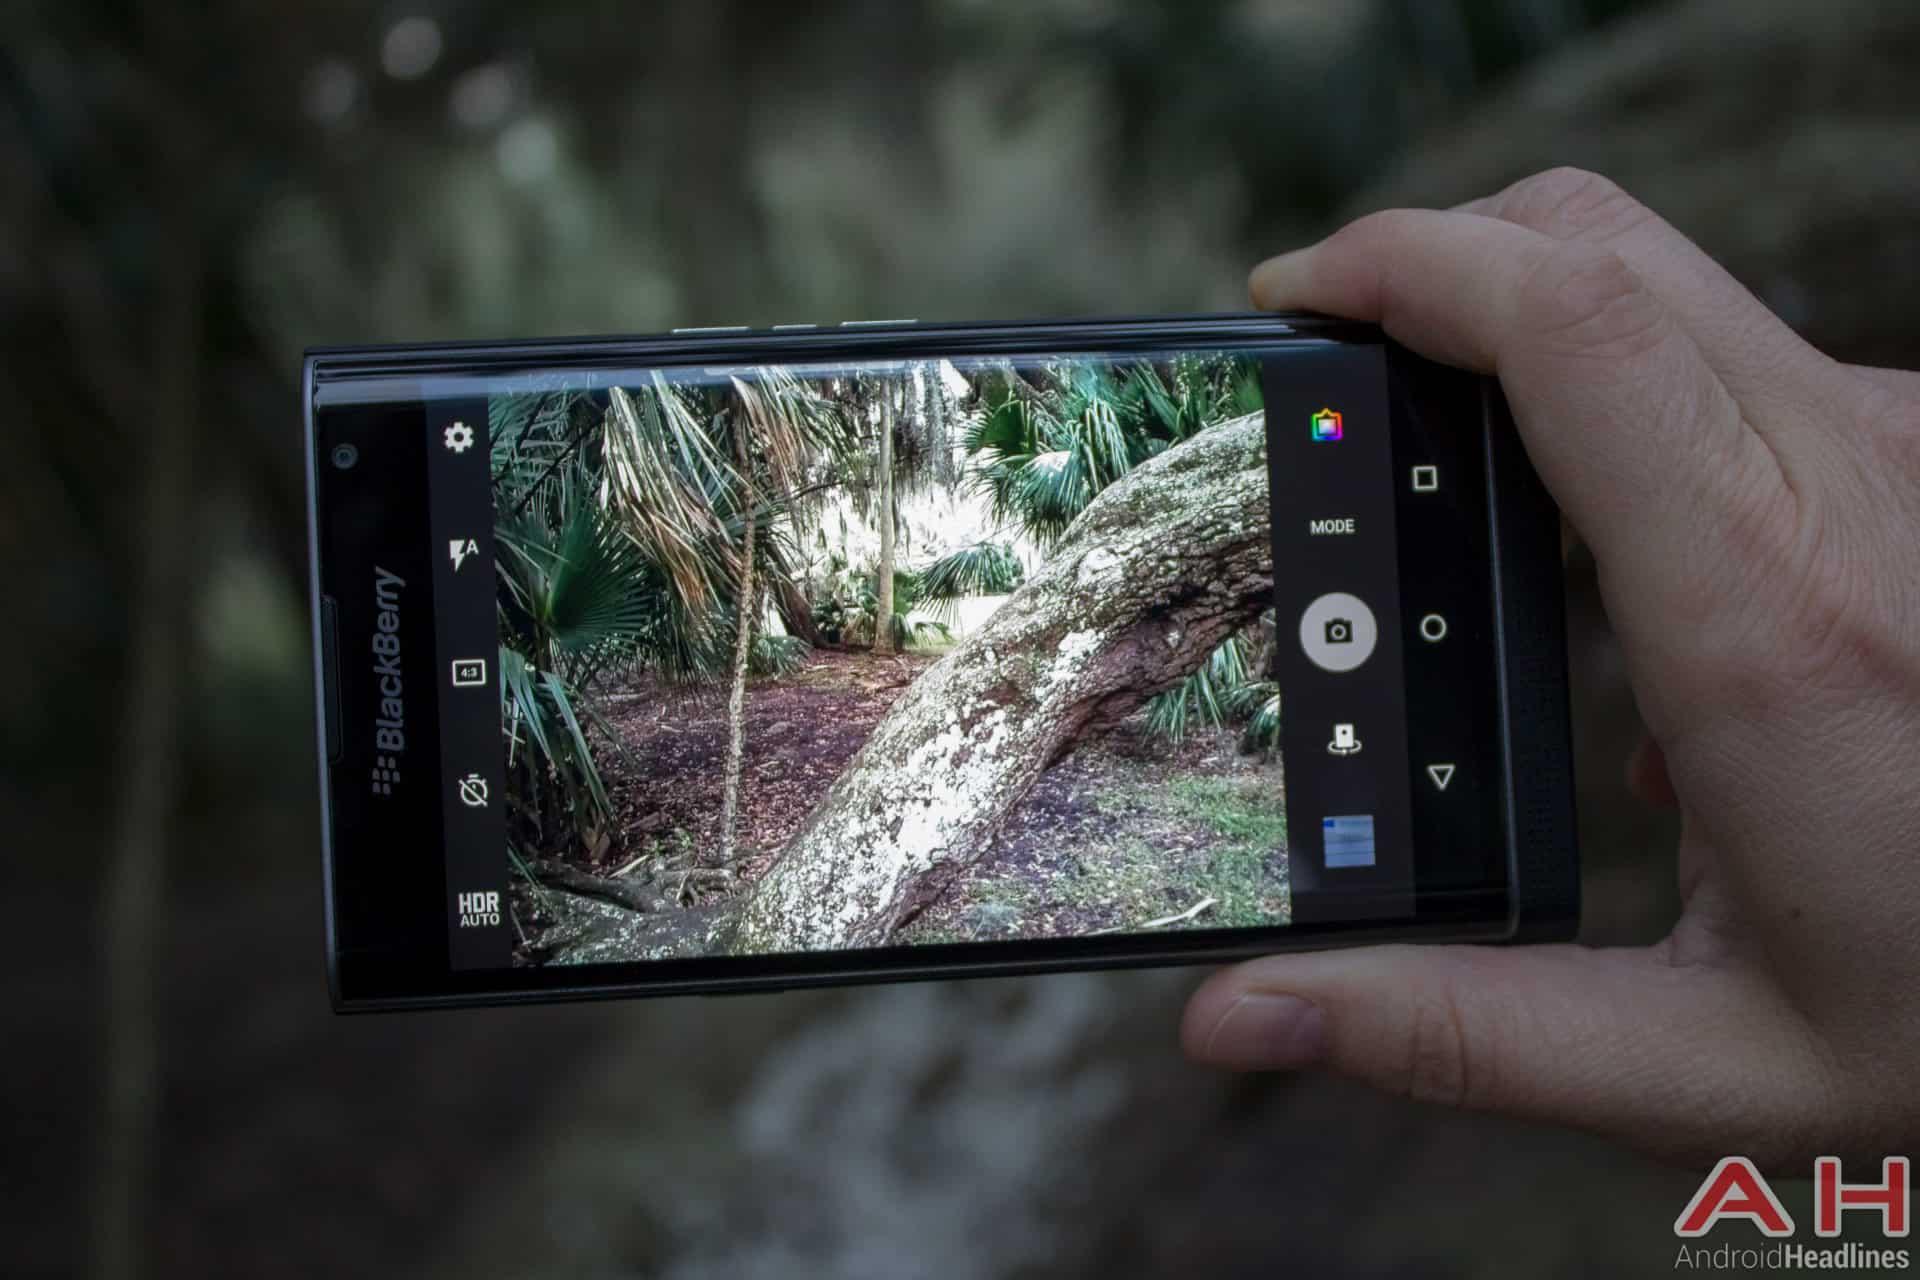 Blackberry-Priv-AH-camera